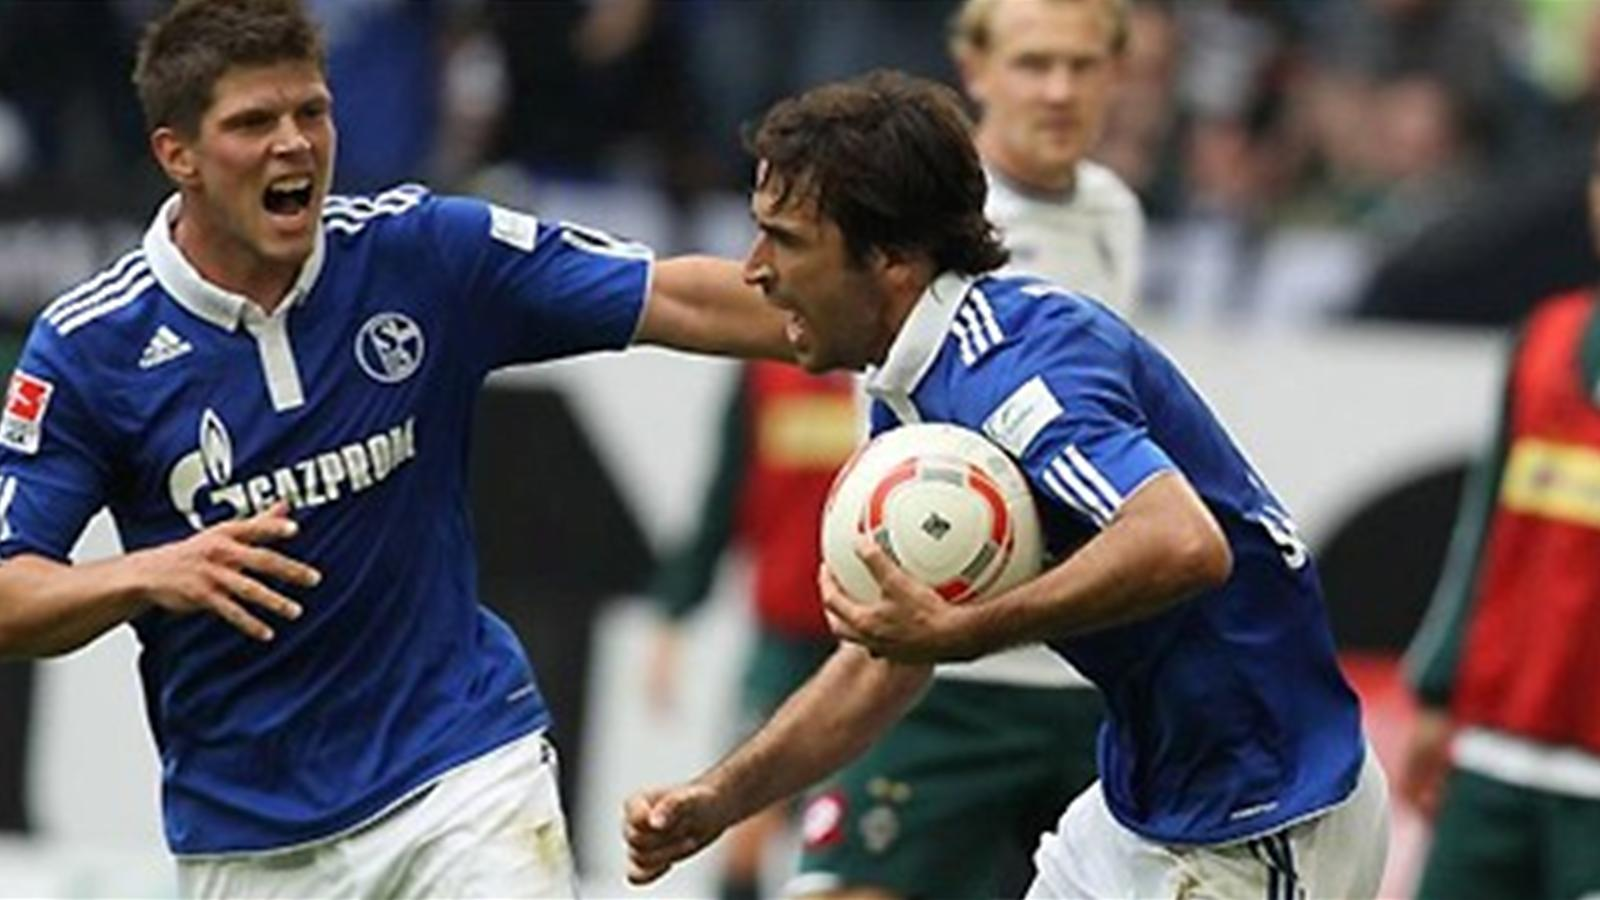 Шальке- боруссия 1- 0 гол рауля